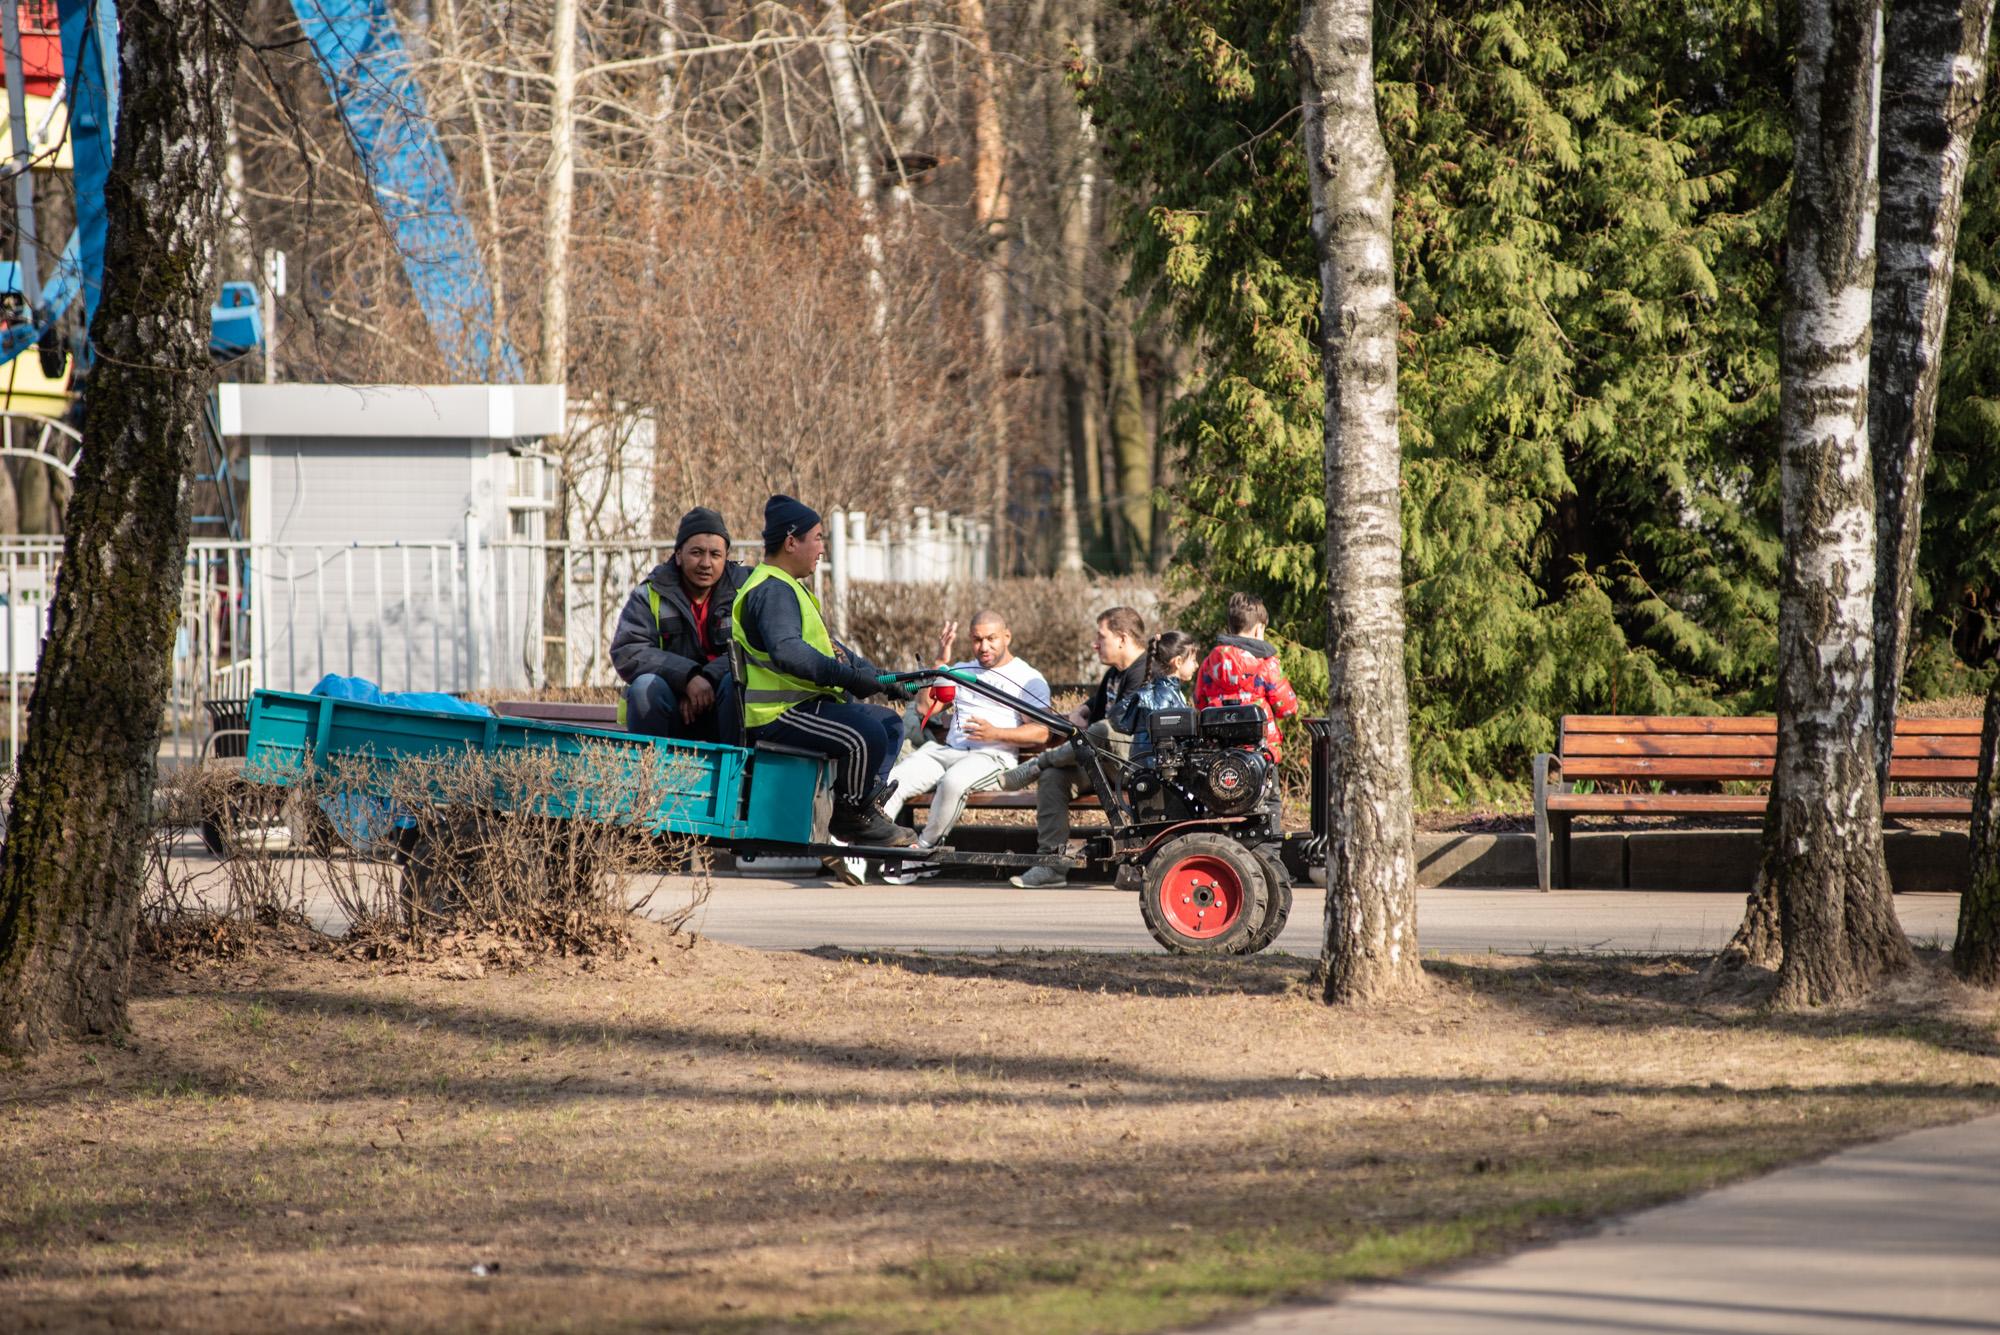 работники парка